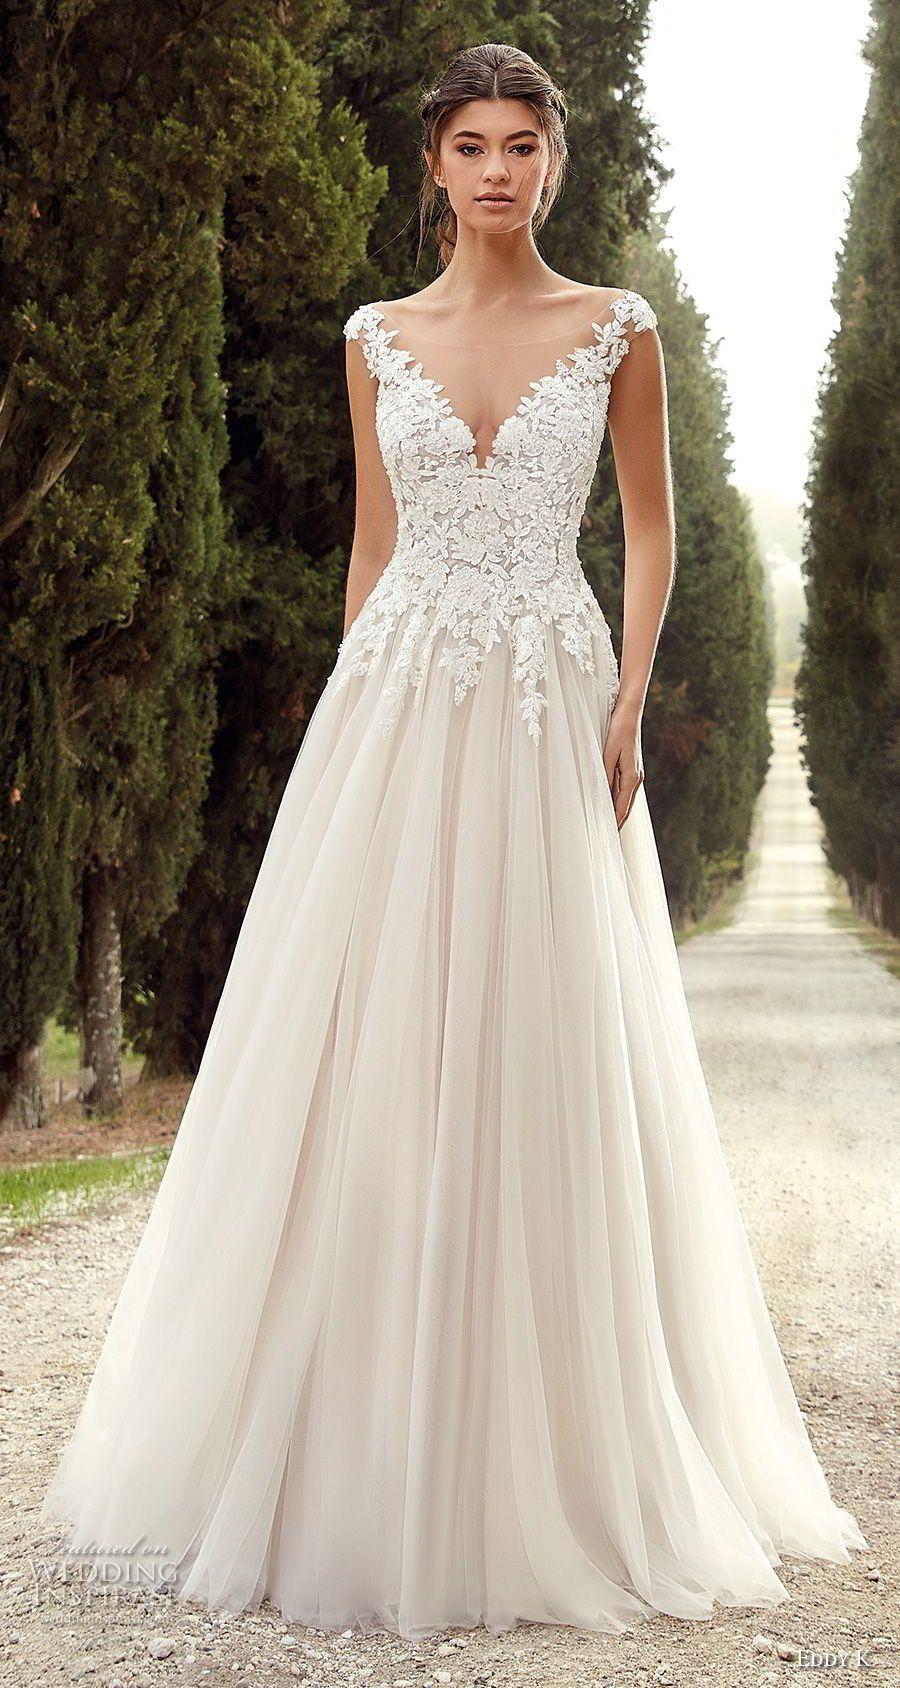 5e152b58e9 eddy k 2019 ek cap sleeves v neck heavily embellished bodice romantic a  line wedding dress (4) mv -- Eddy K. 2019 Wedding Dresses